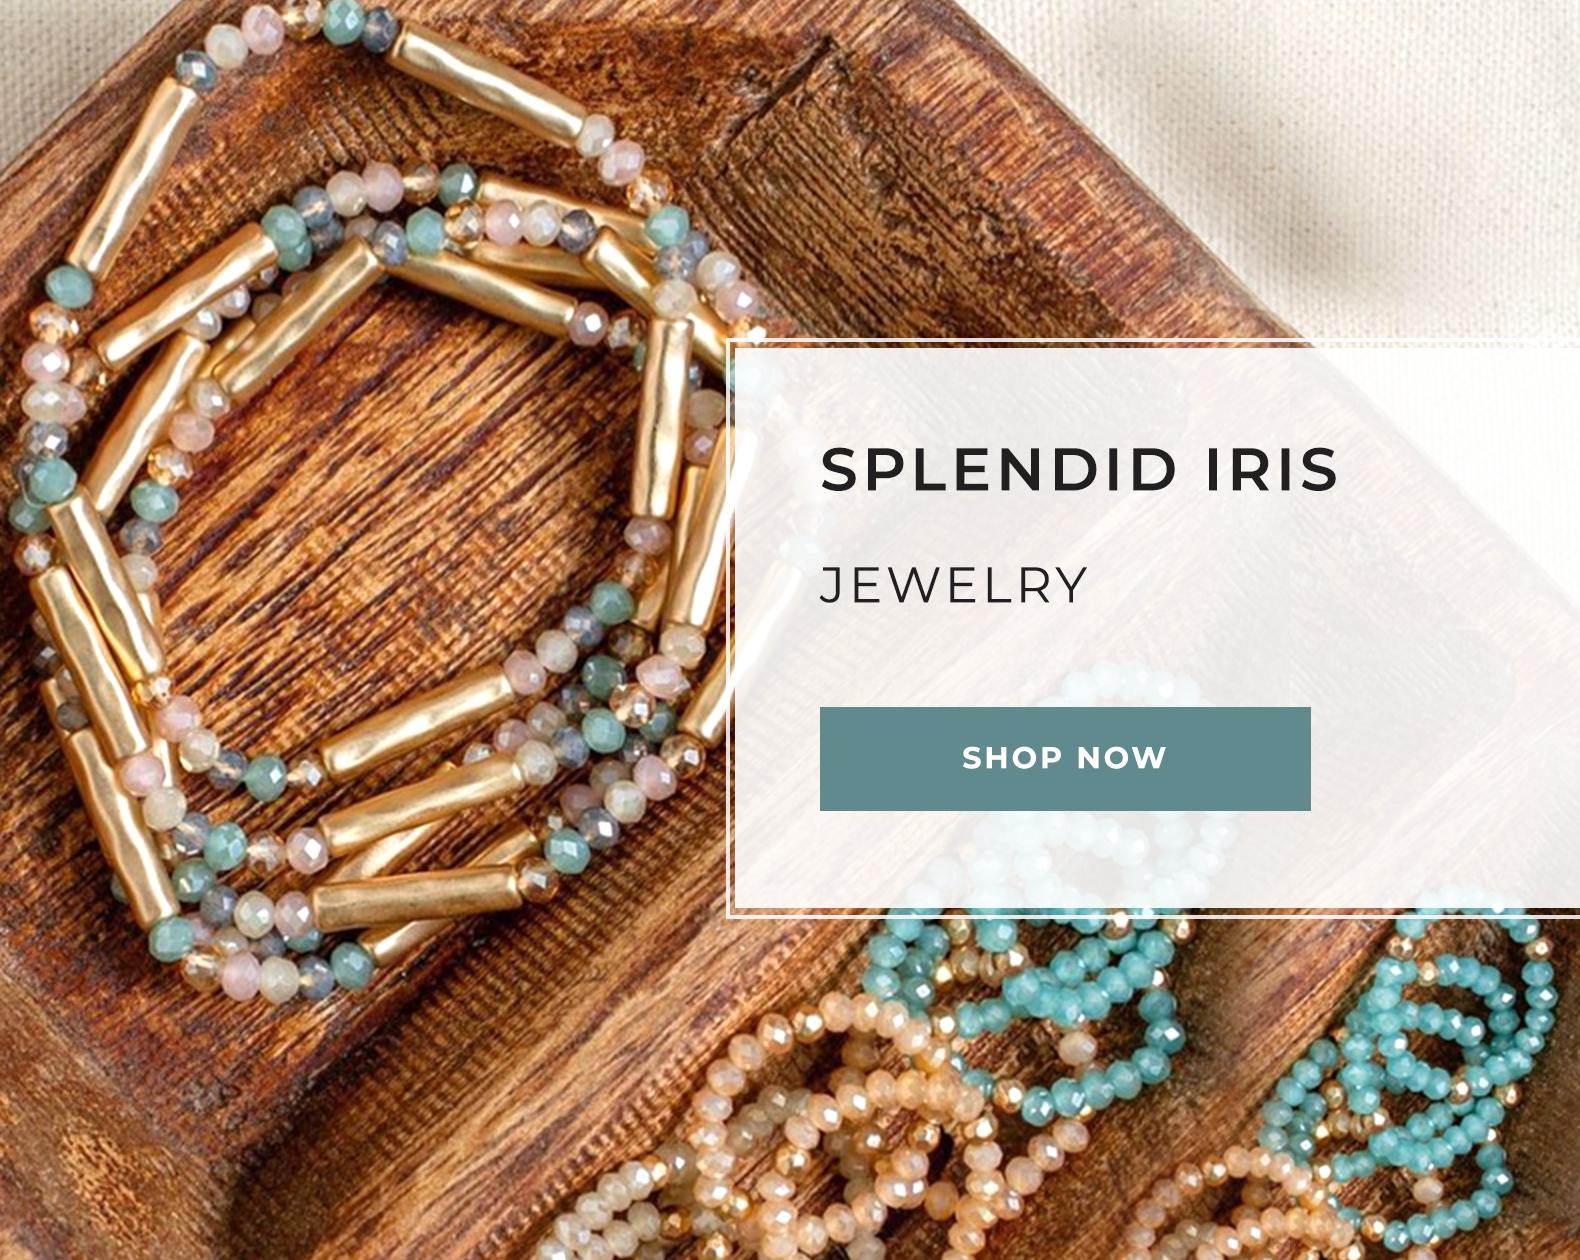 Splendid Iris